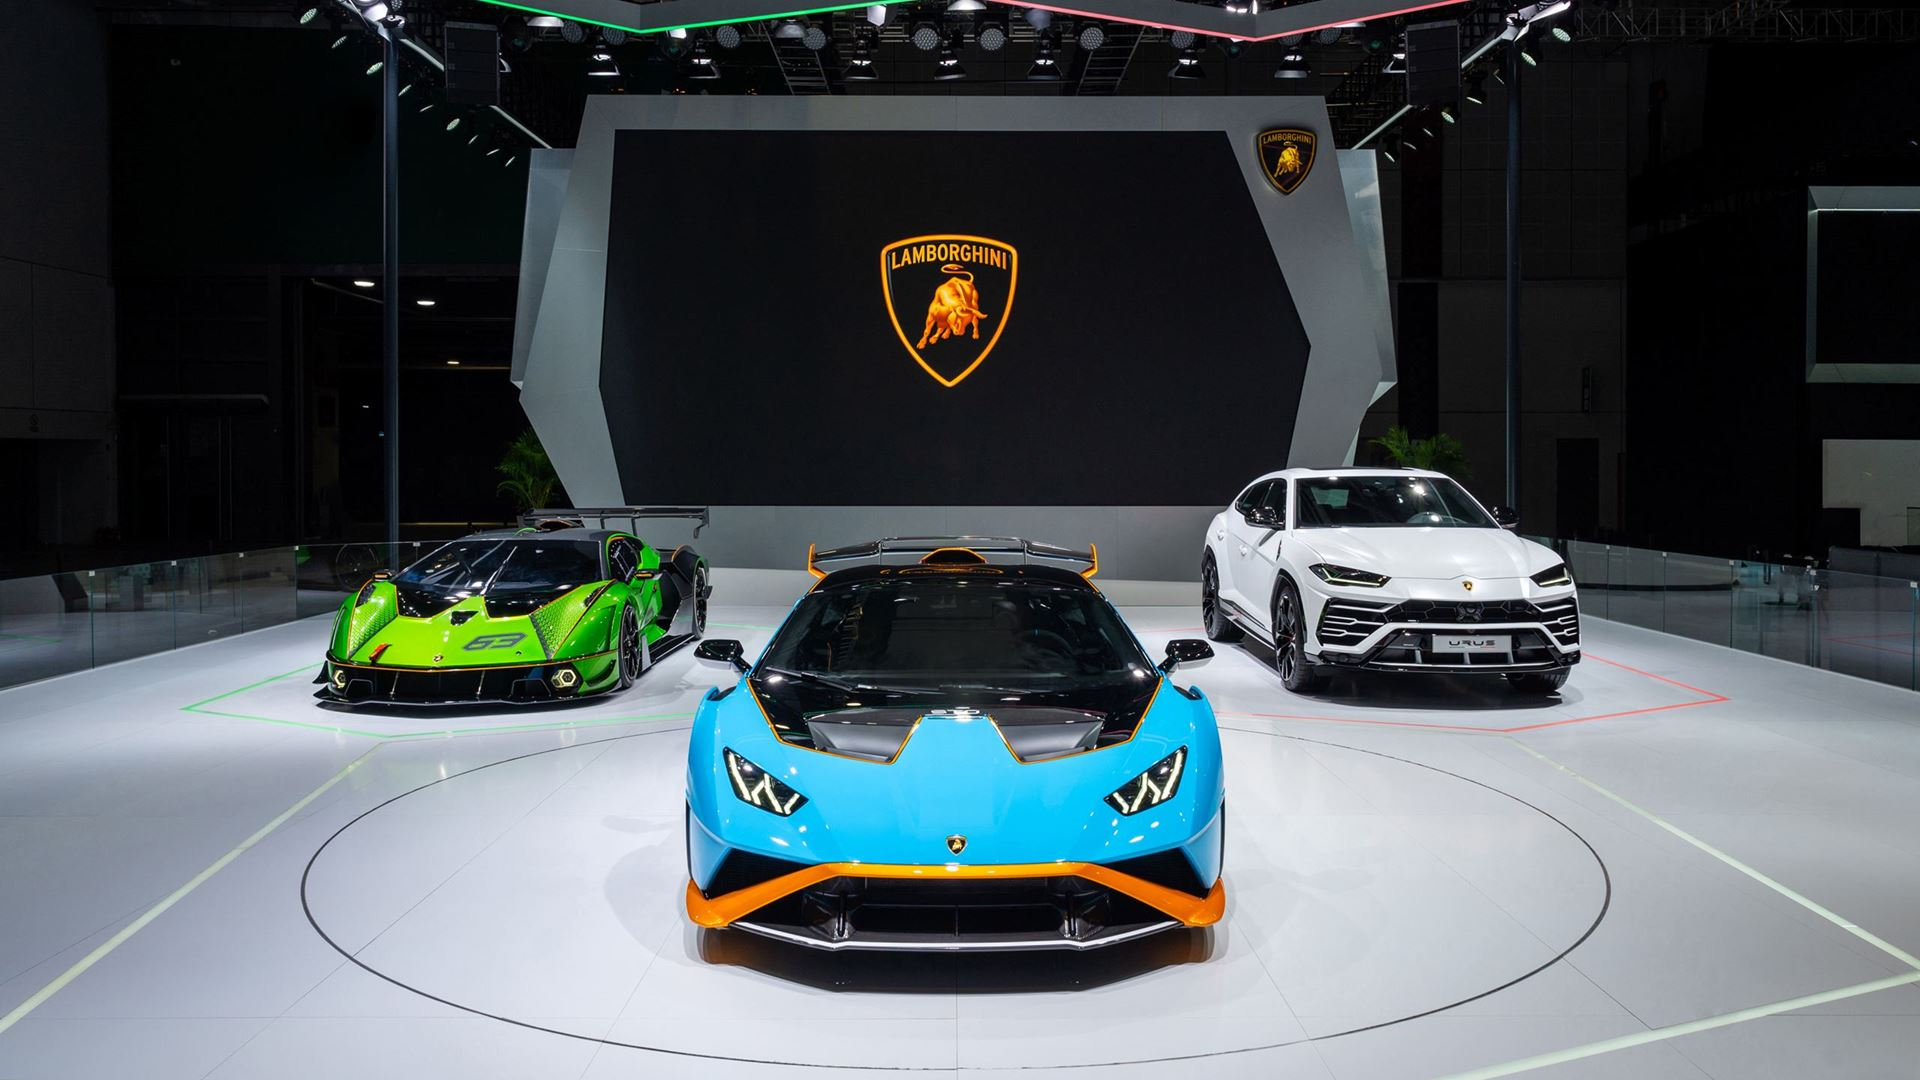 Three premieres for Automobili Lamborghini at the 2021 Shanghai Auto Show - Image 8